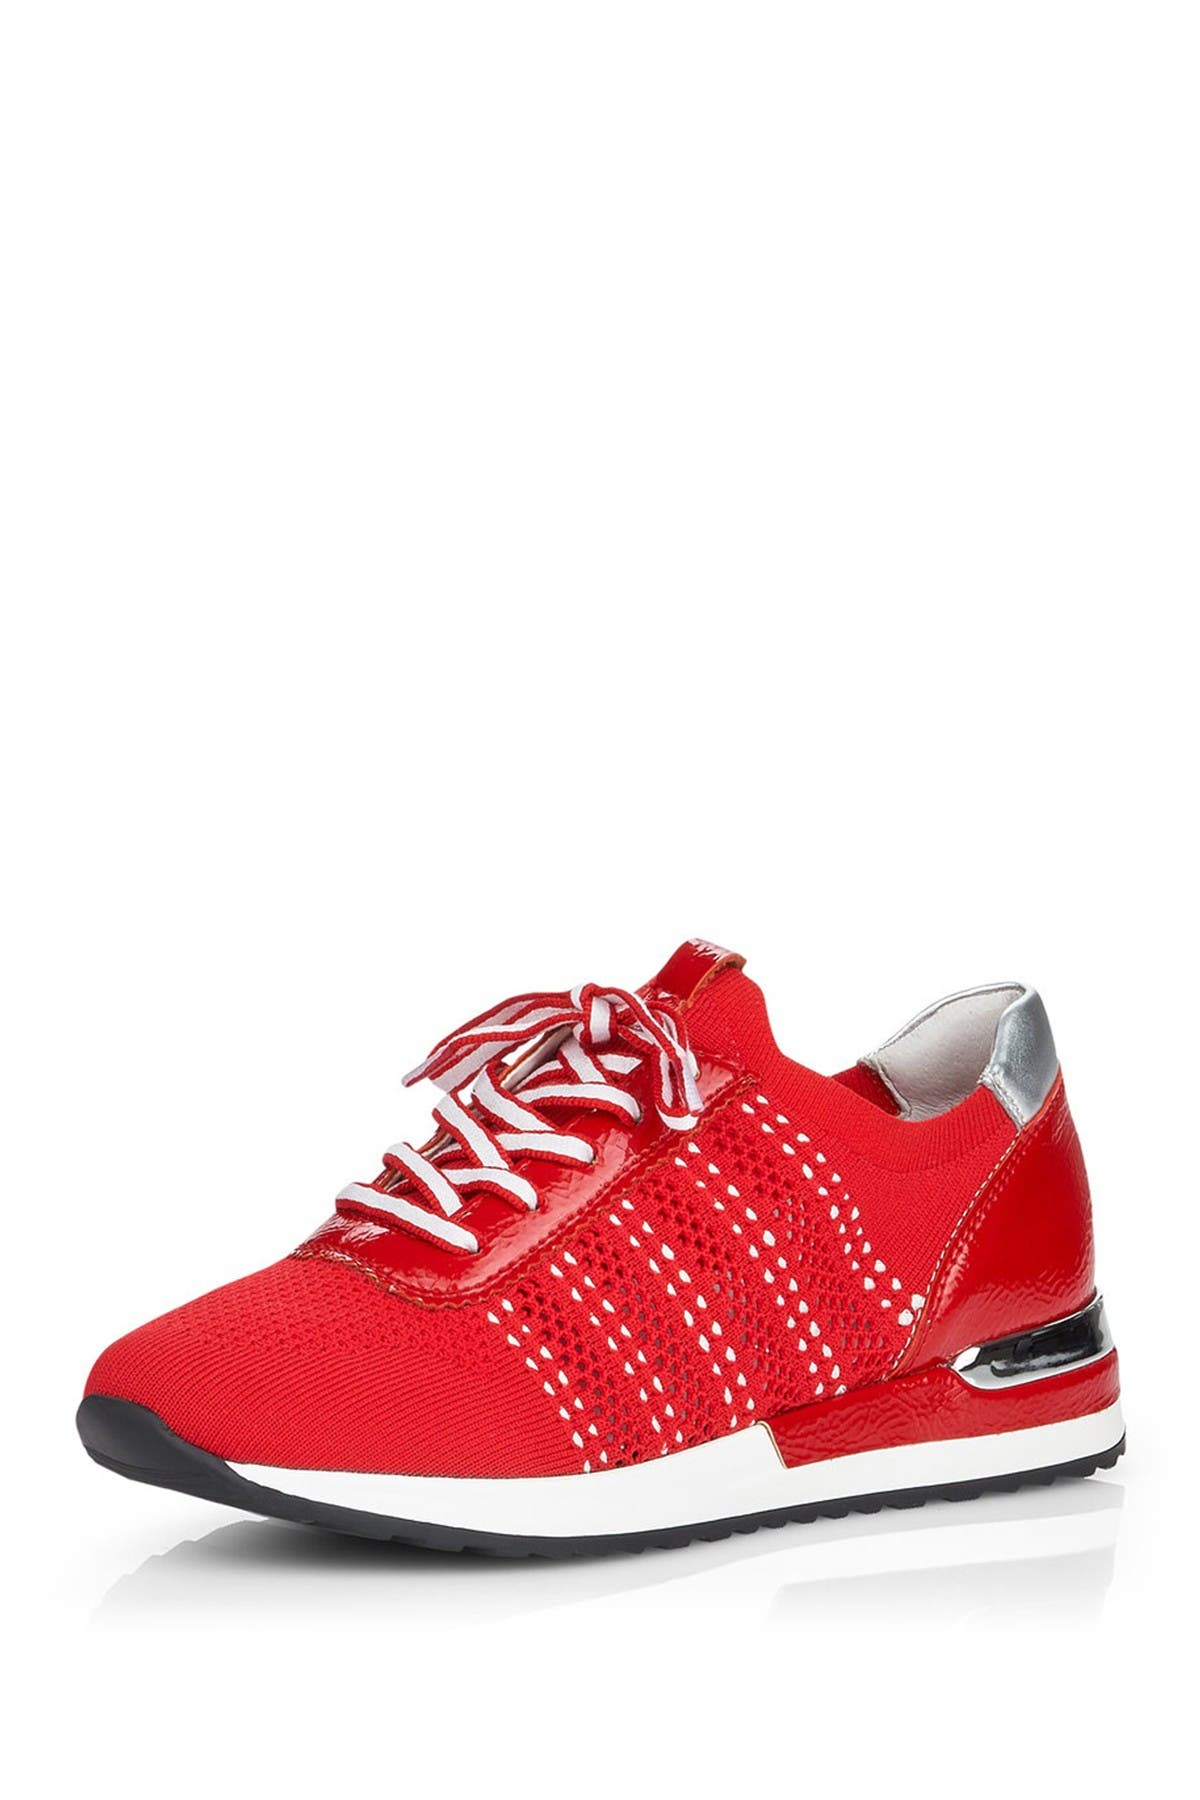 Image of Remonte Elmira Knit Sneaker